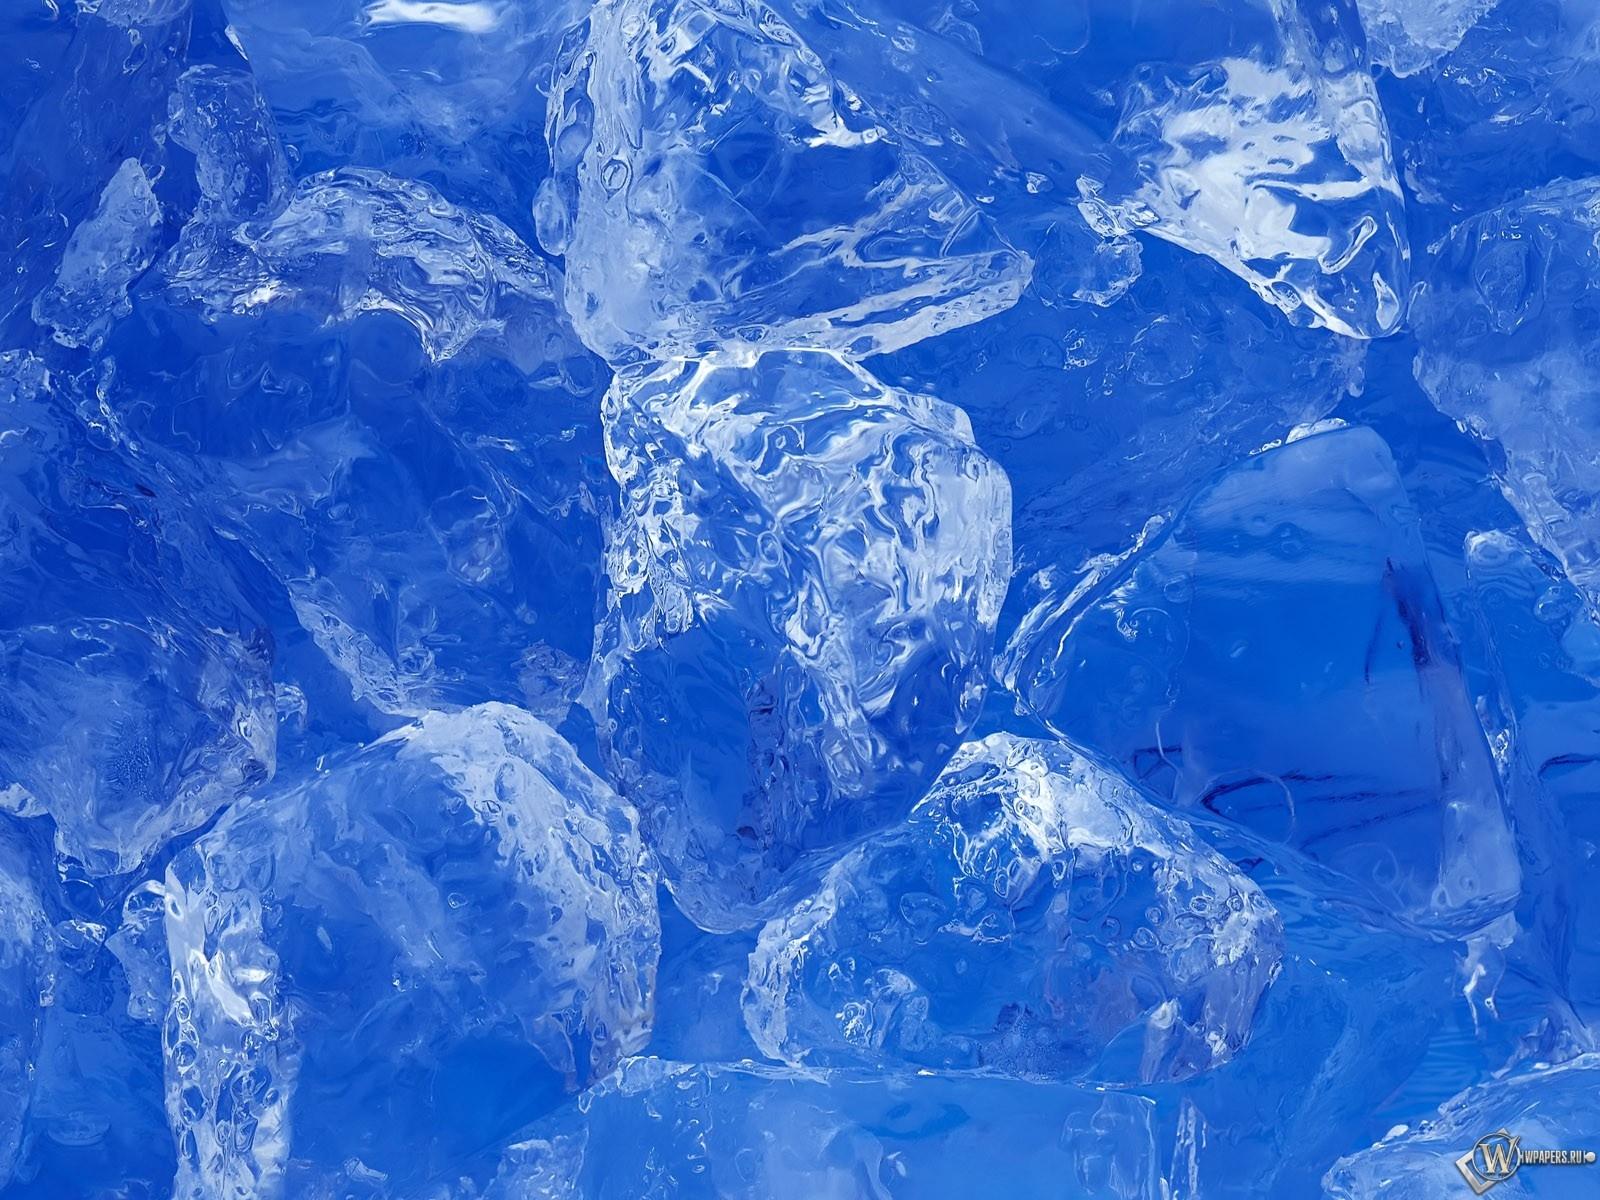 Кусочки льда 1600x1200